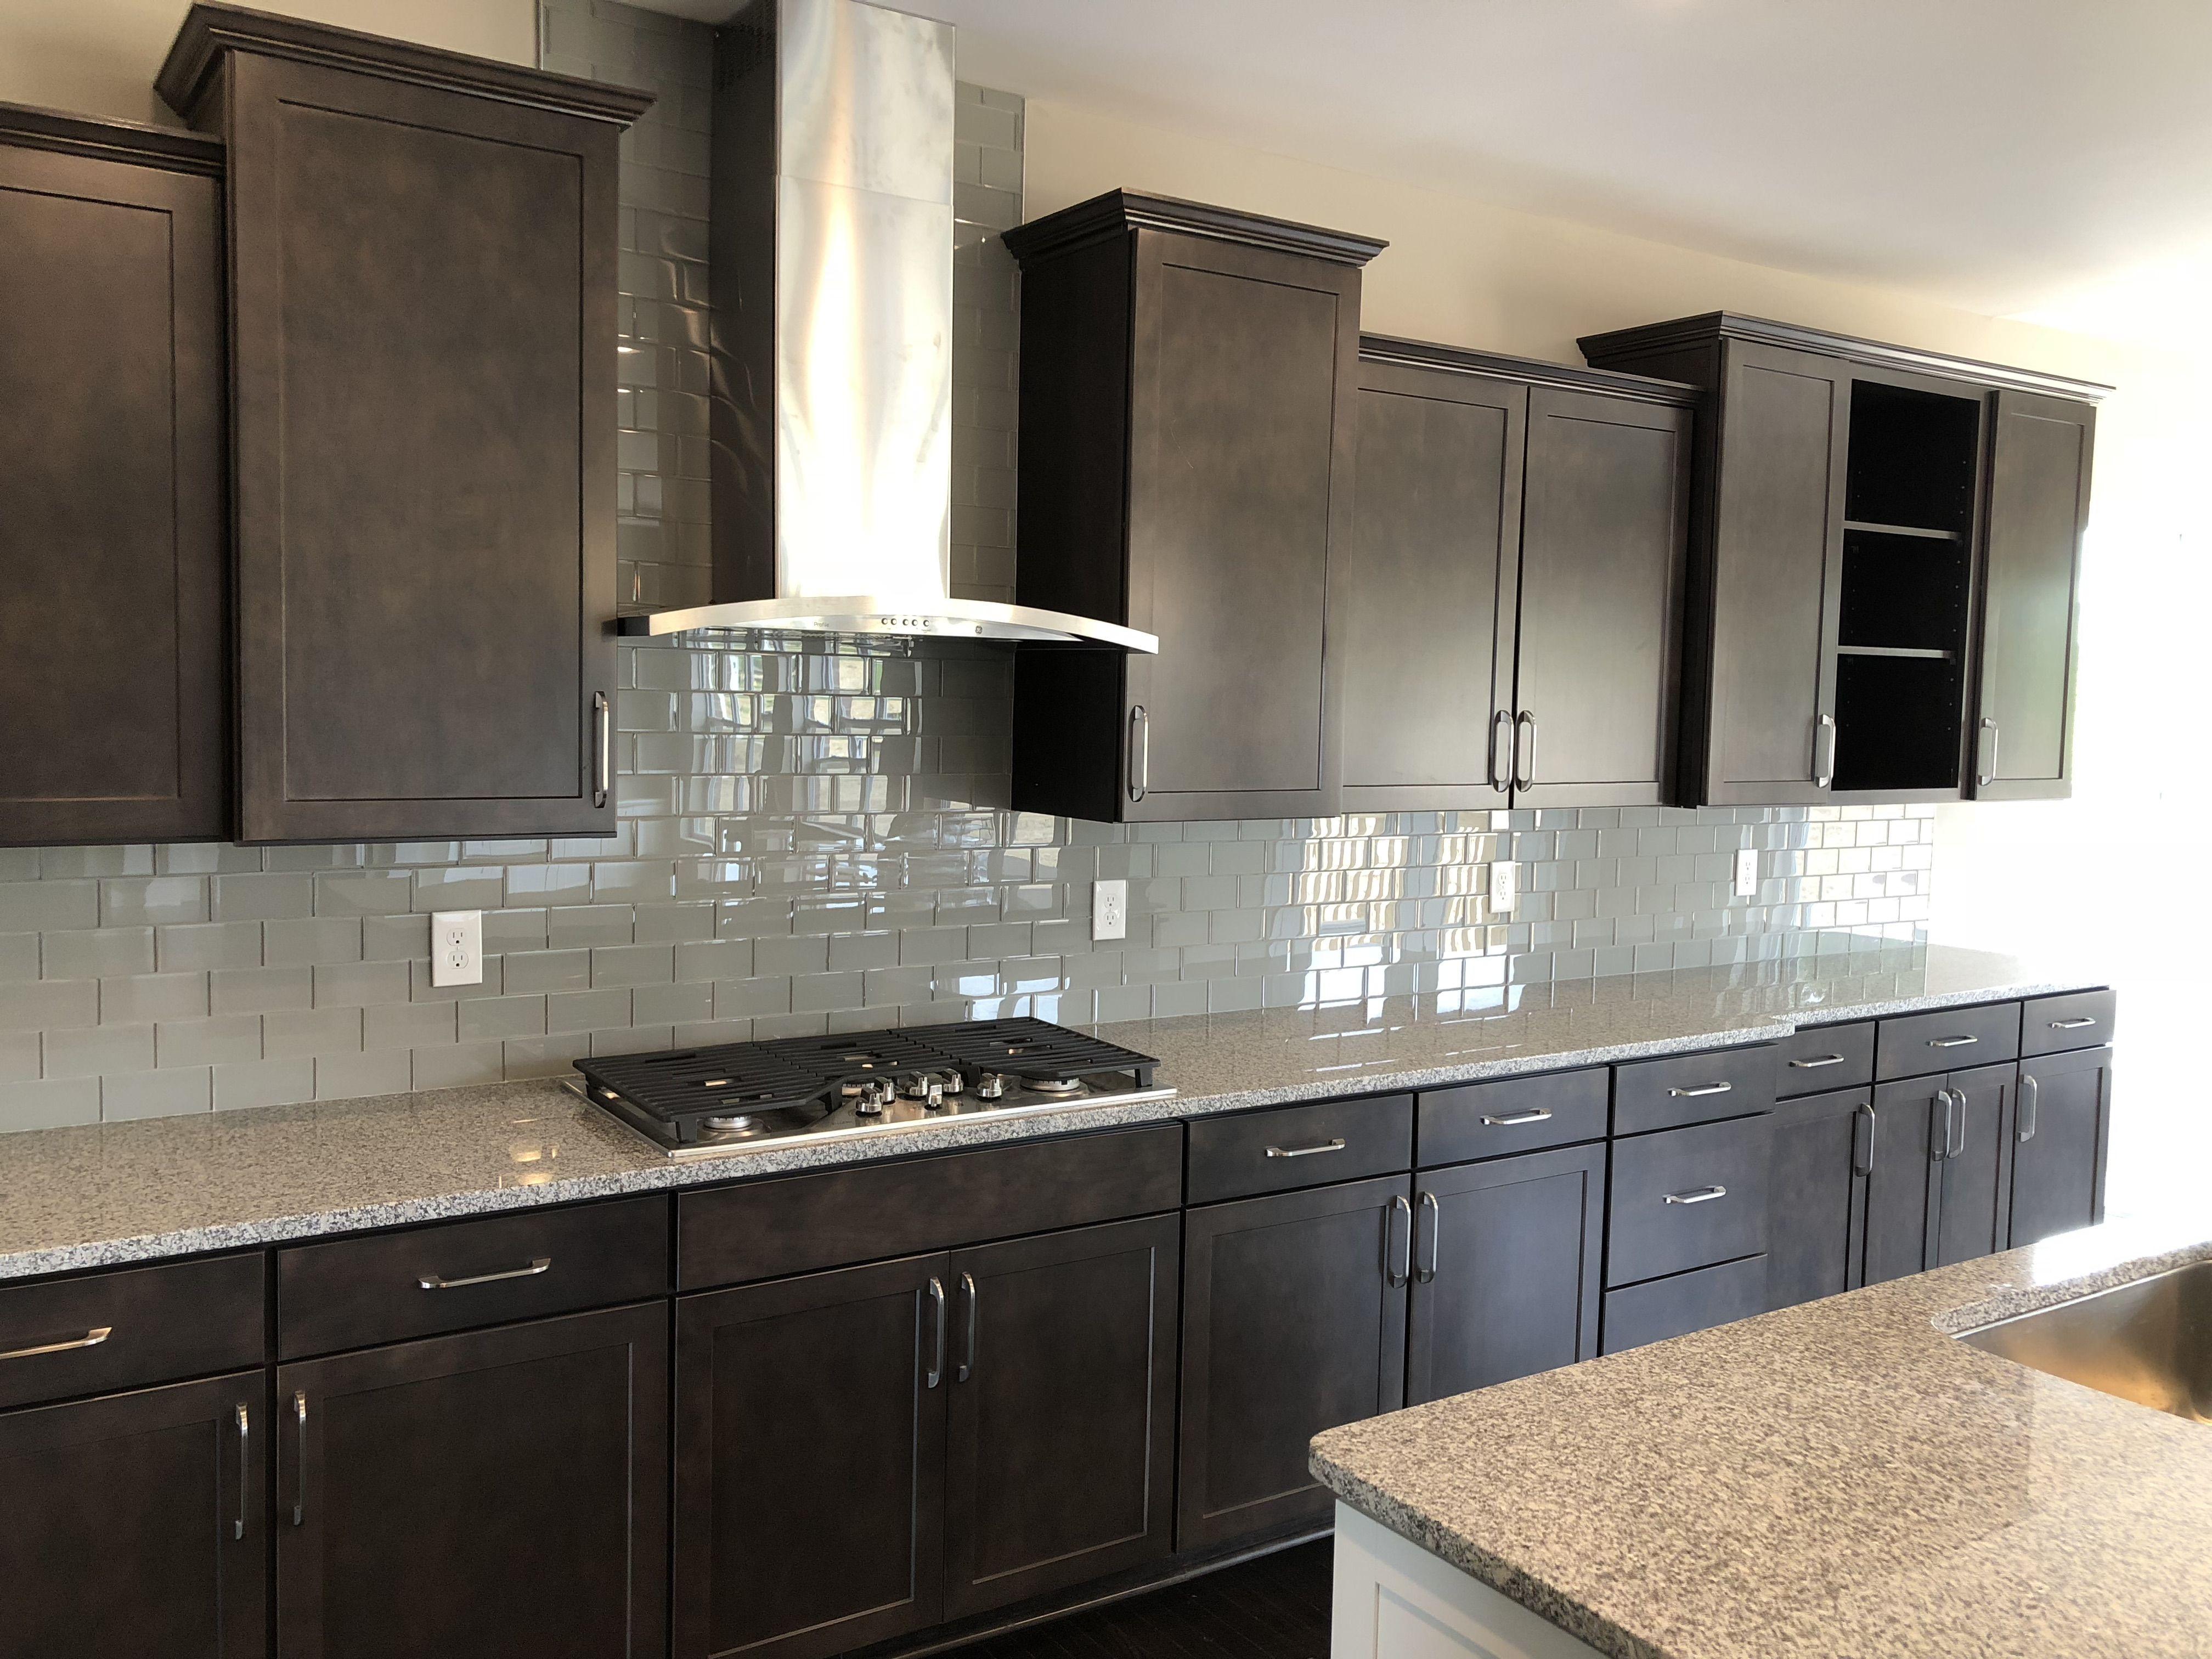 Gourmet Kitchen Winstead Flagstone Perimeter Cabintes Kitchen Cabinets Home Kitchens Kitchen